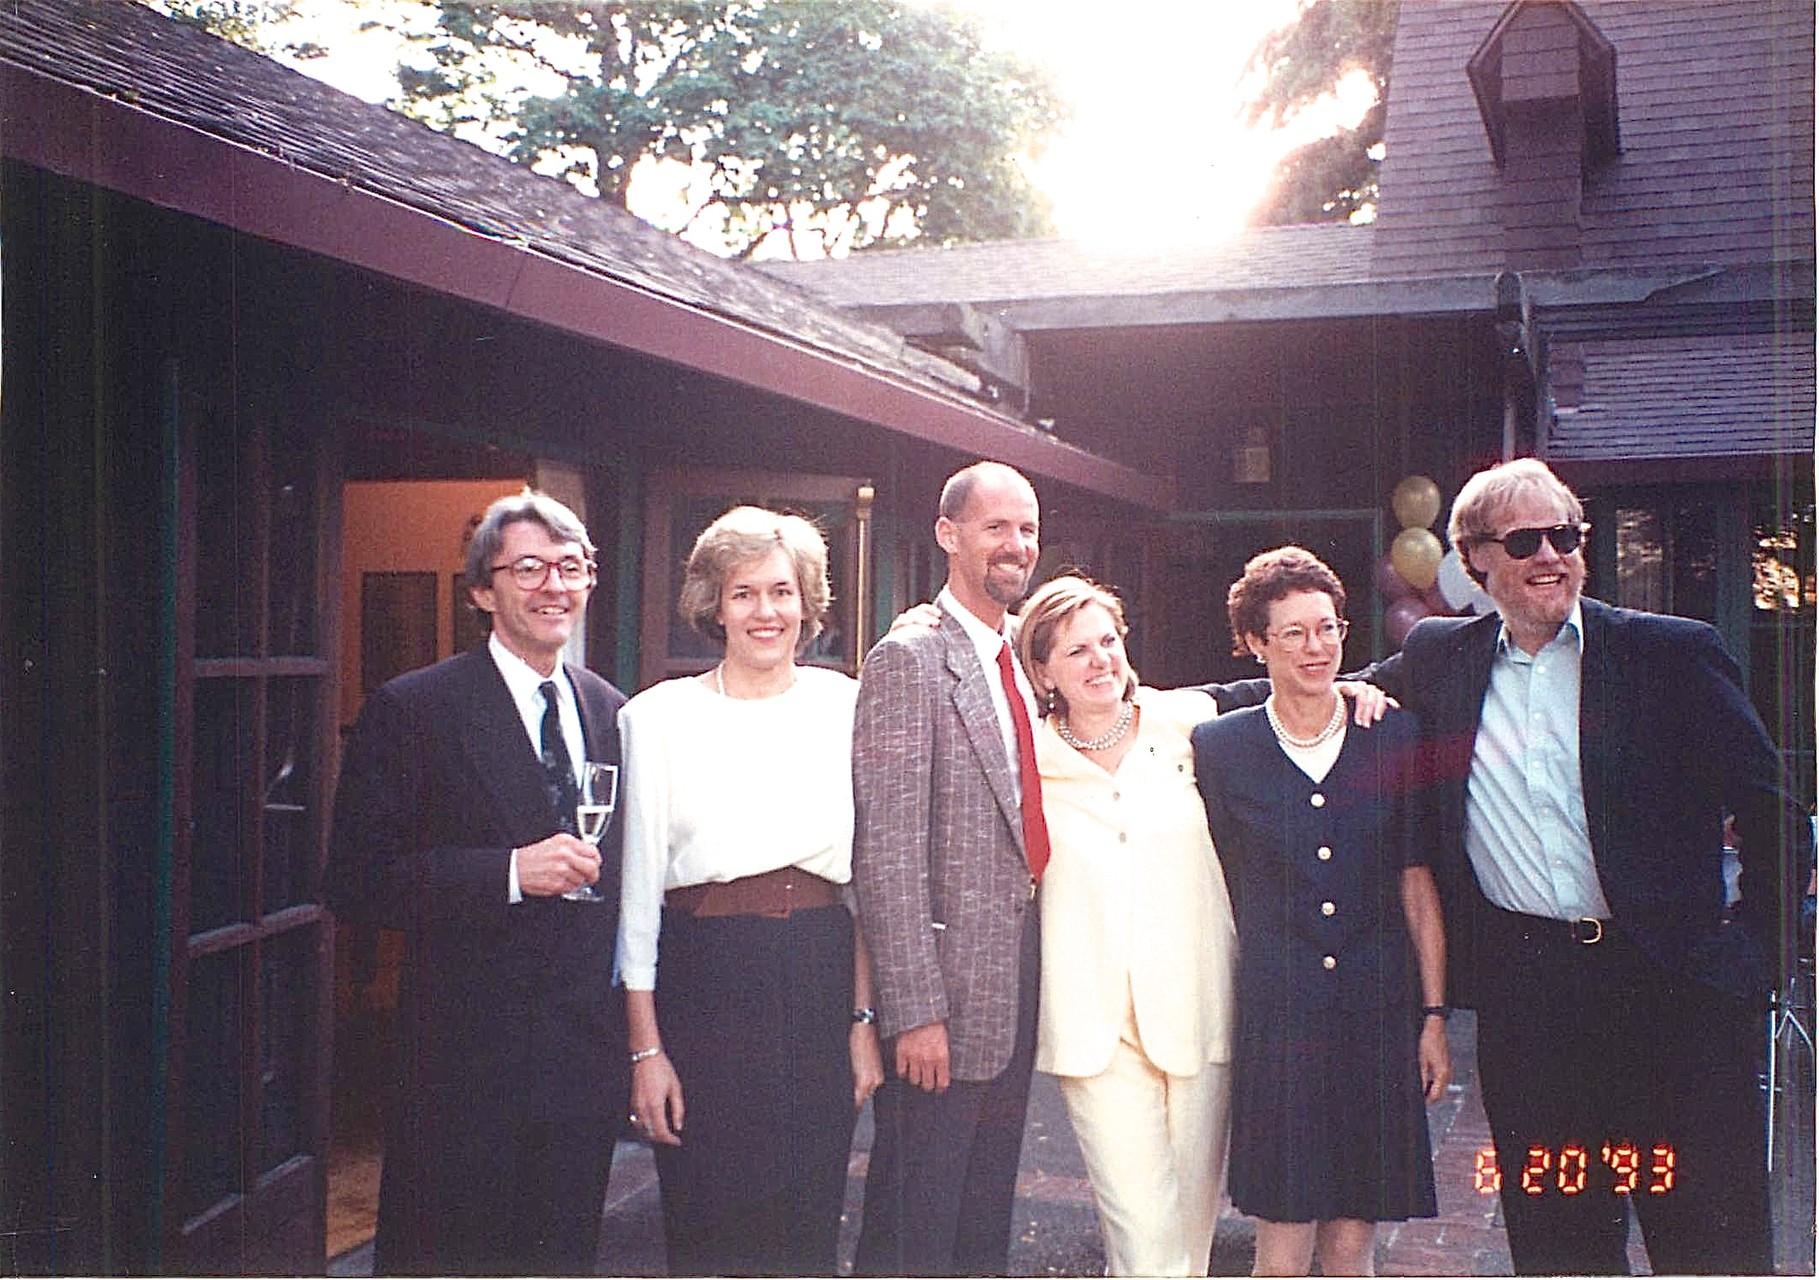 1993 CA, Dave Martin, Lorraine Gudas, Steve, Shirley Clift, Barbara Levinson, Buddy Ullman: lab reunion